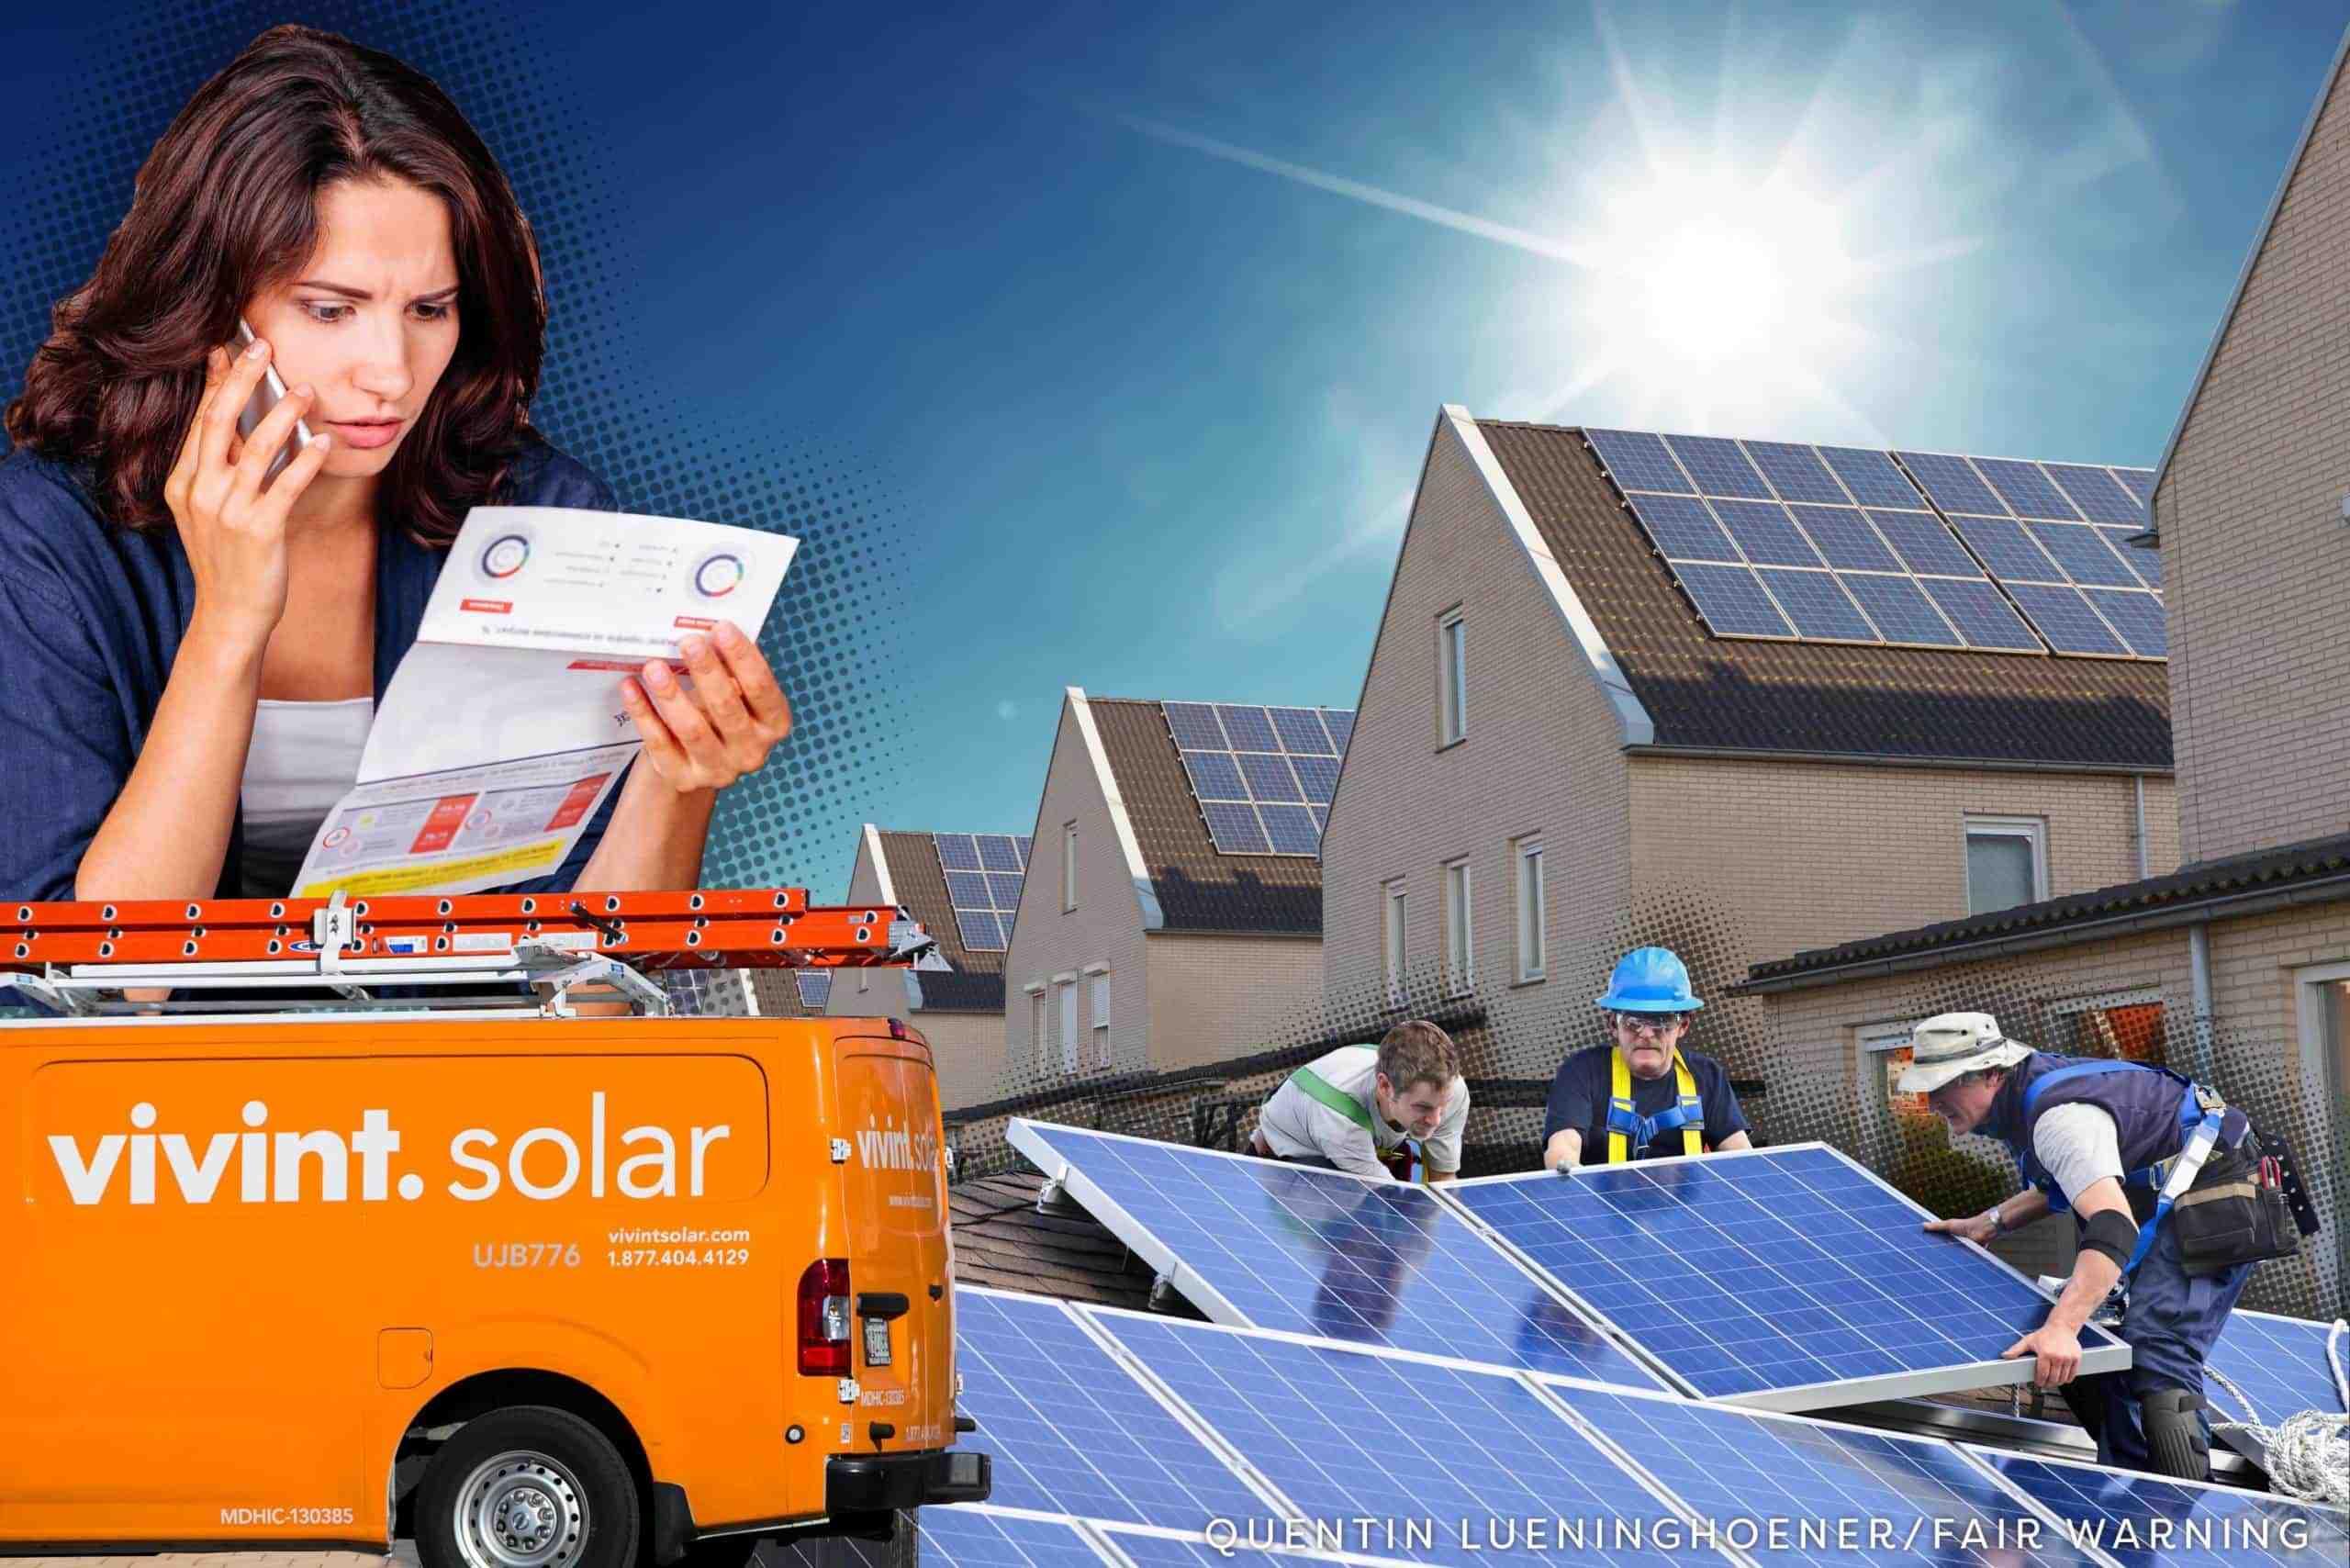 Is Vivint Solar a legitimate company?